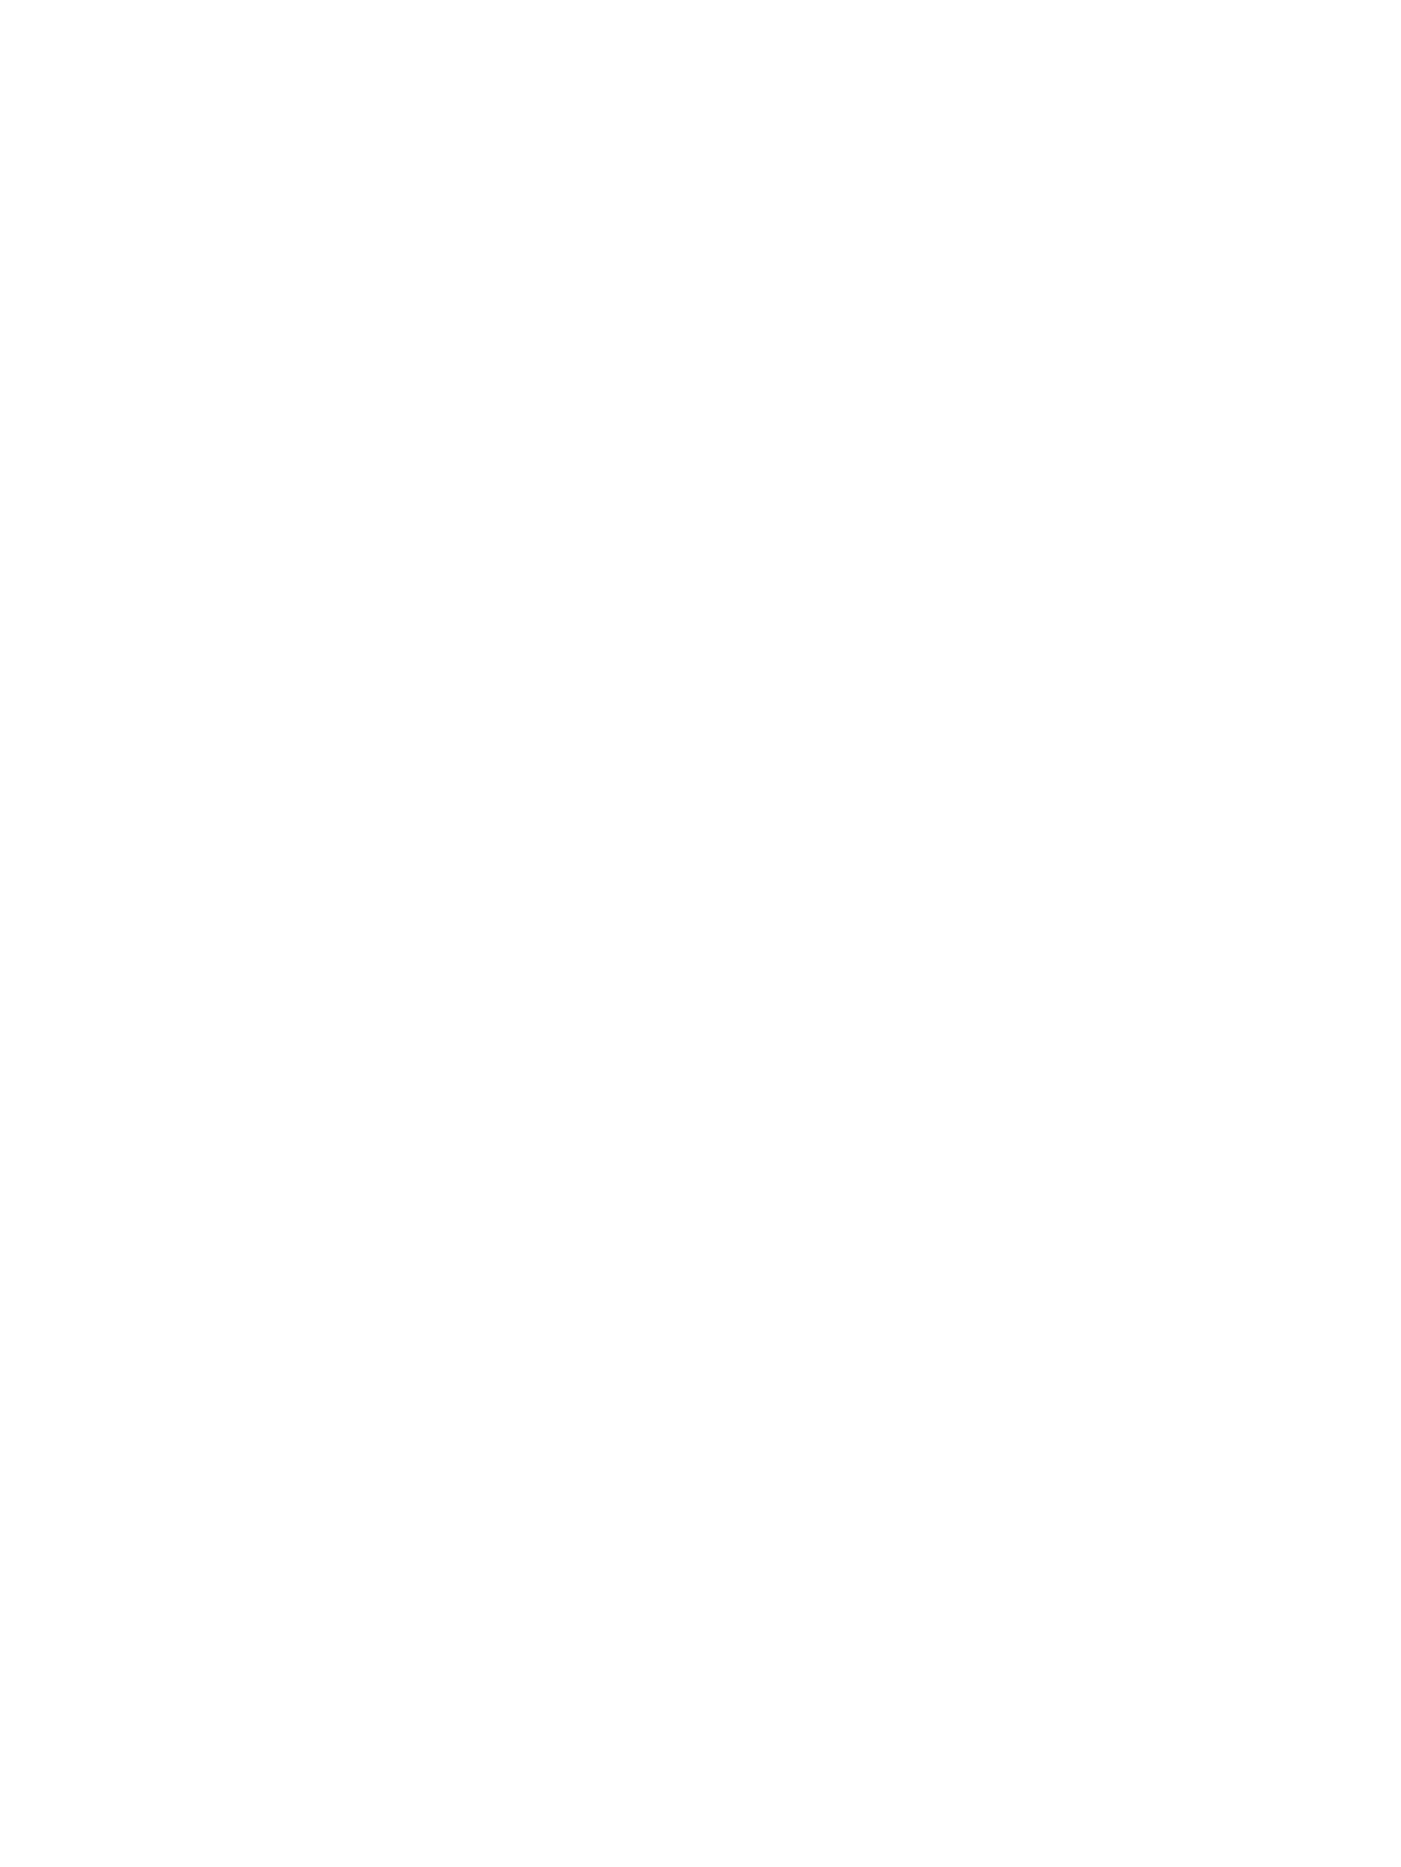 Трусы стринг vendetta londonБюстье<br>трусы<br><br>Цвет: Красный<br>Декор: None<br>Стилистика: None<br>Направление: Бюстье<br>Пол: Женский<br>Материал: 64%ПА; 22%ЭЛ; 14%ХЛ<br>Размер RU: 42